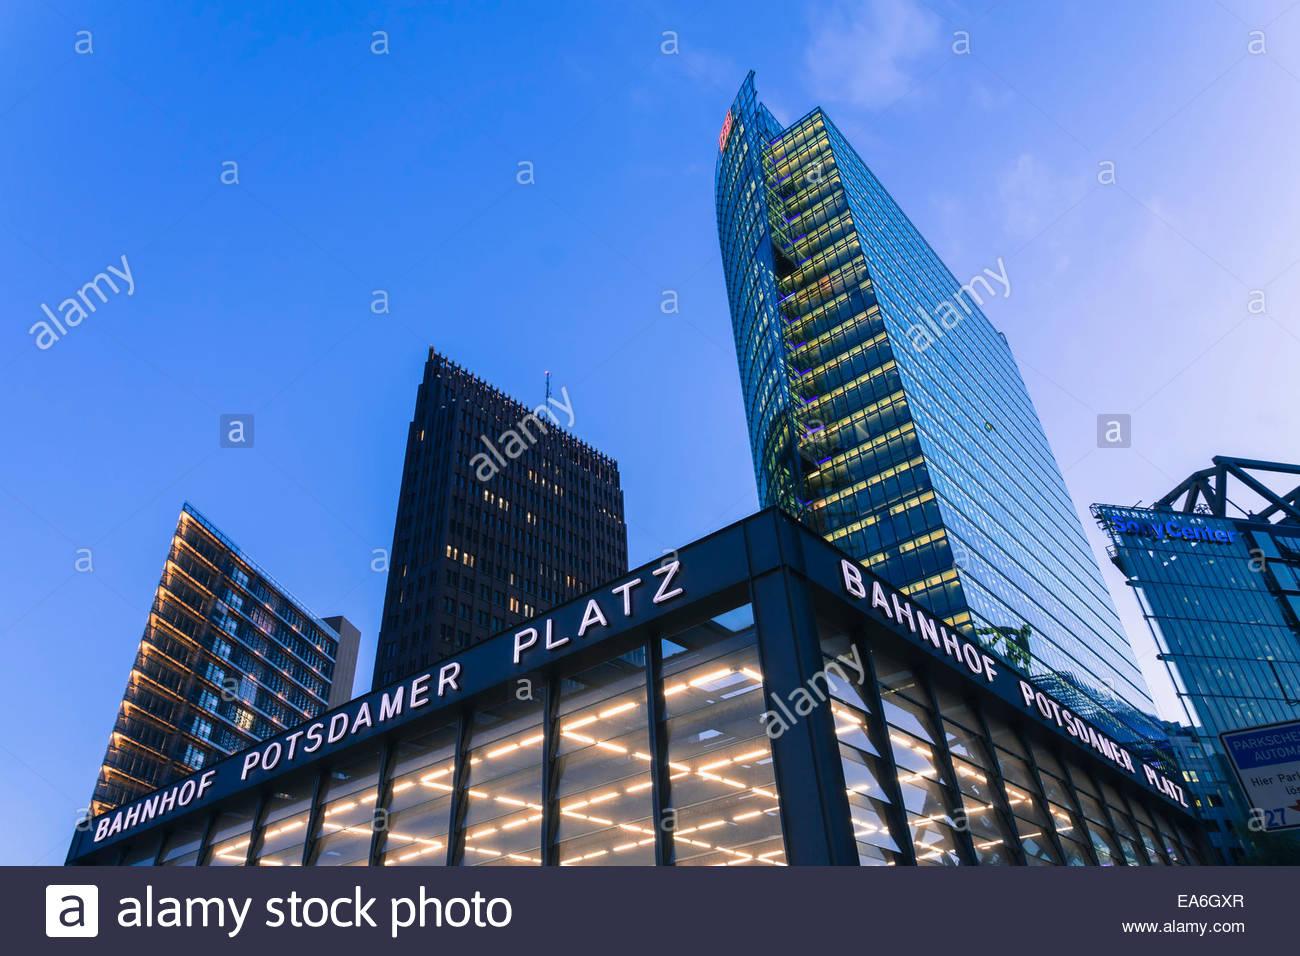 Germany, Berlin, Office buildings at Potsdamer Platz - Stock Image